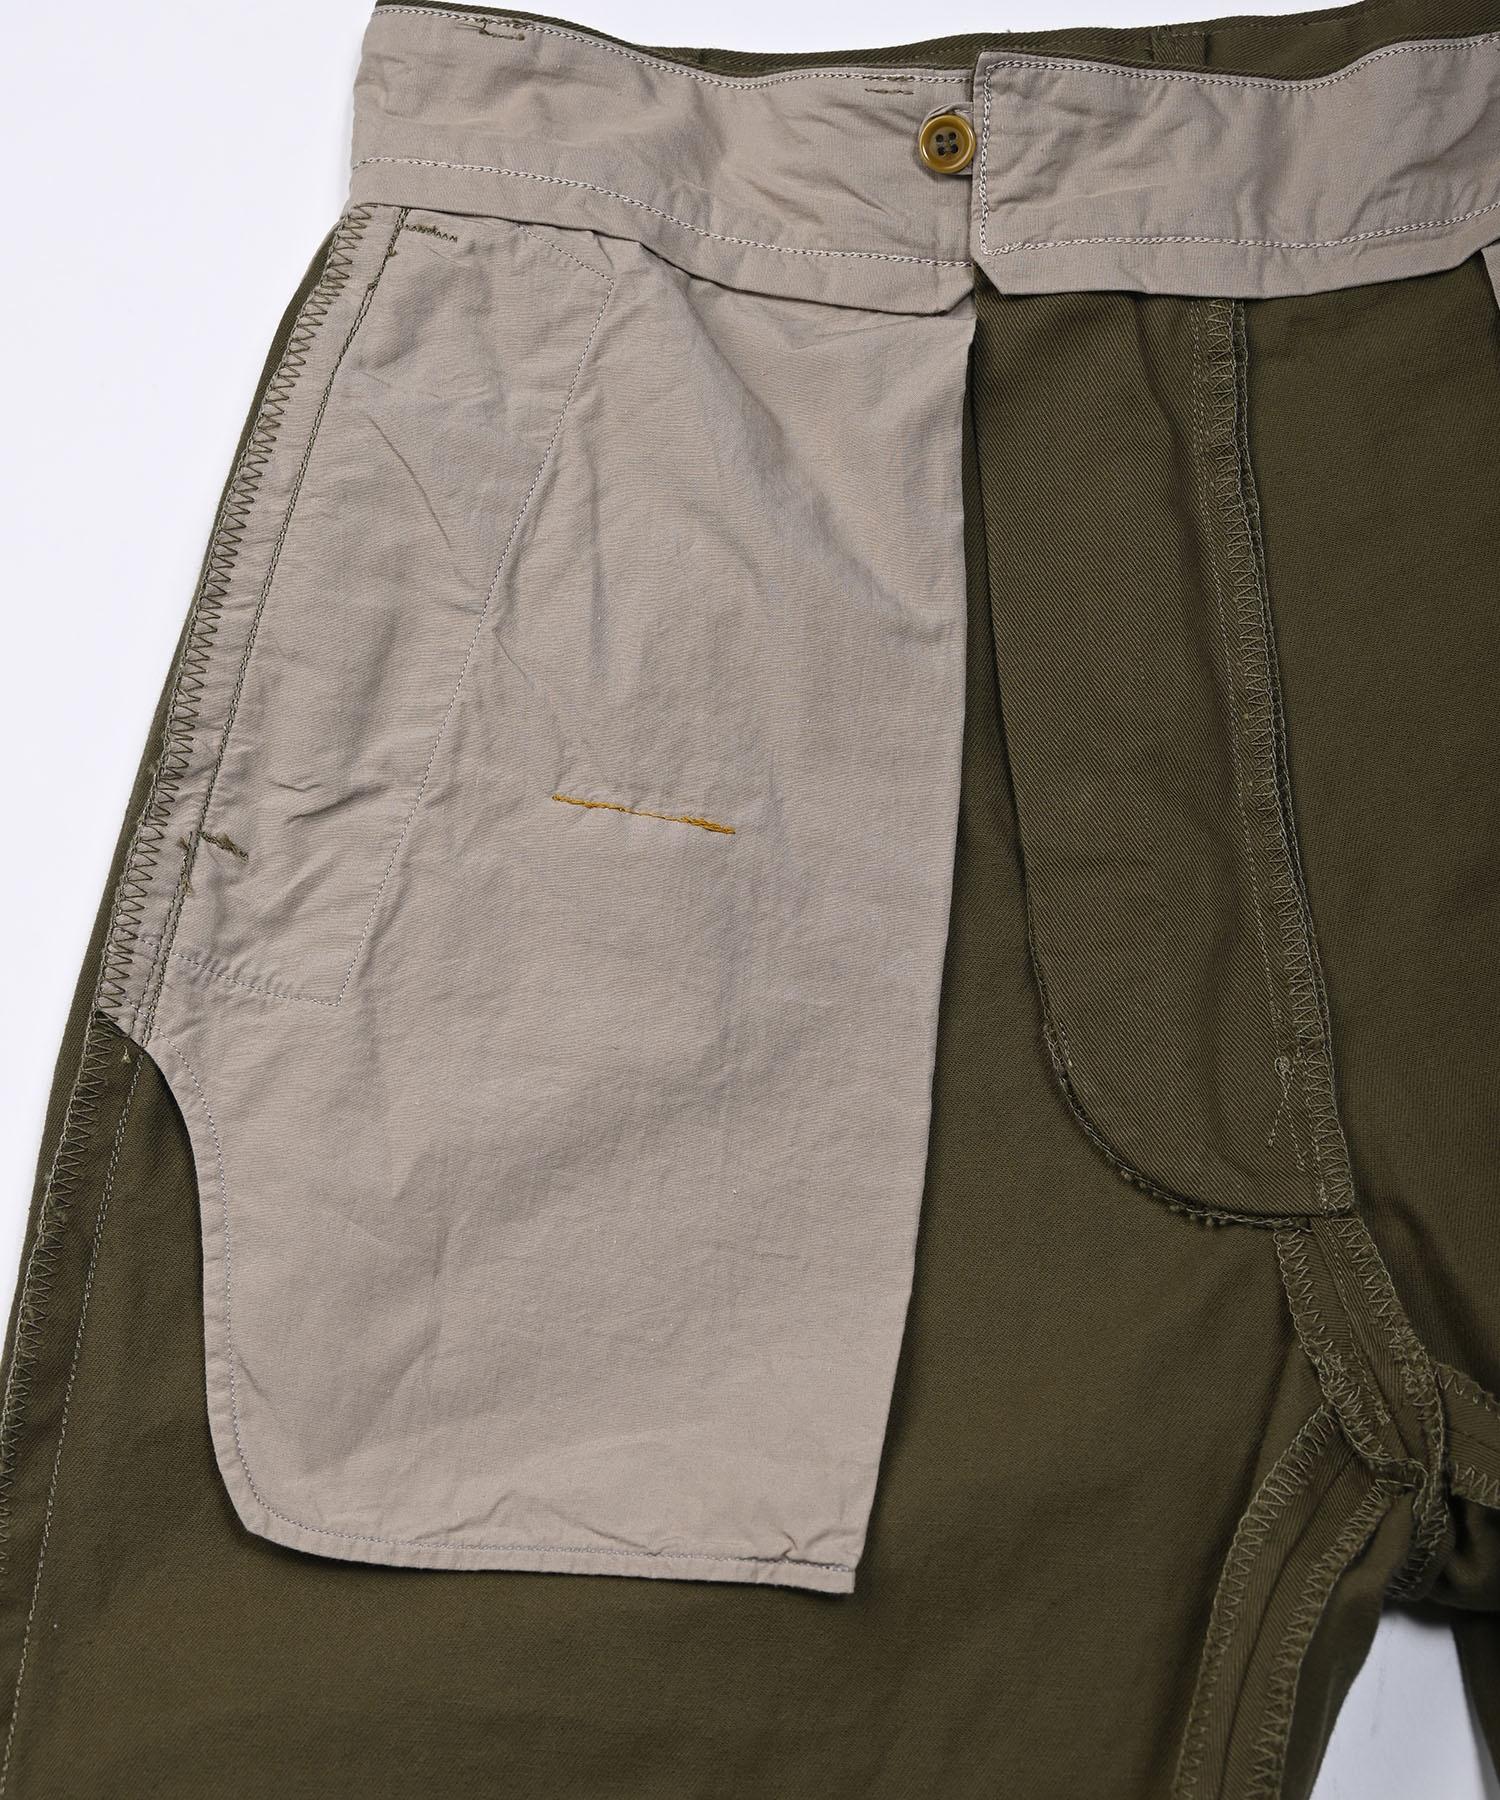 Okome Chino 908 Pants (0421)-5